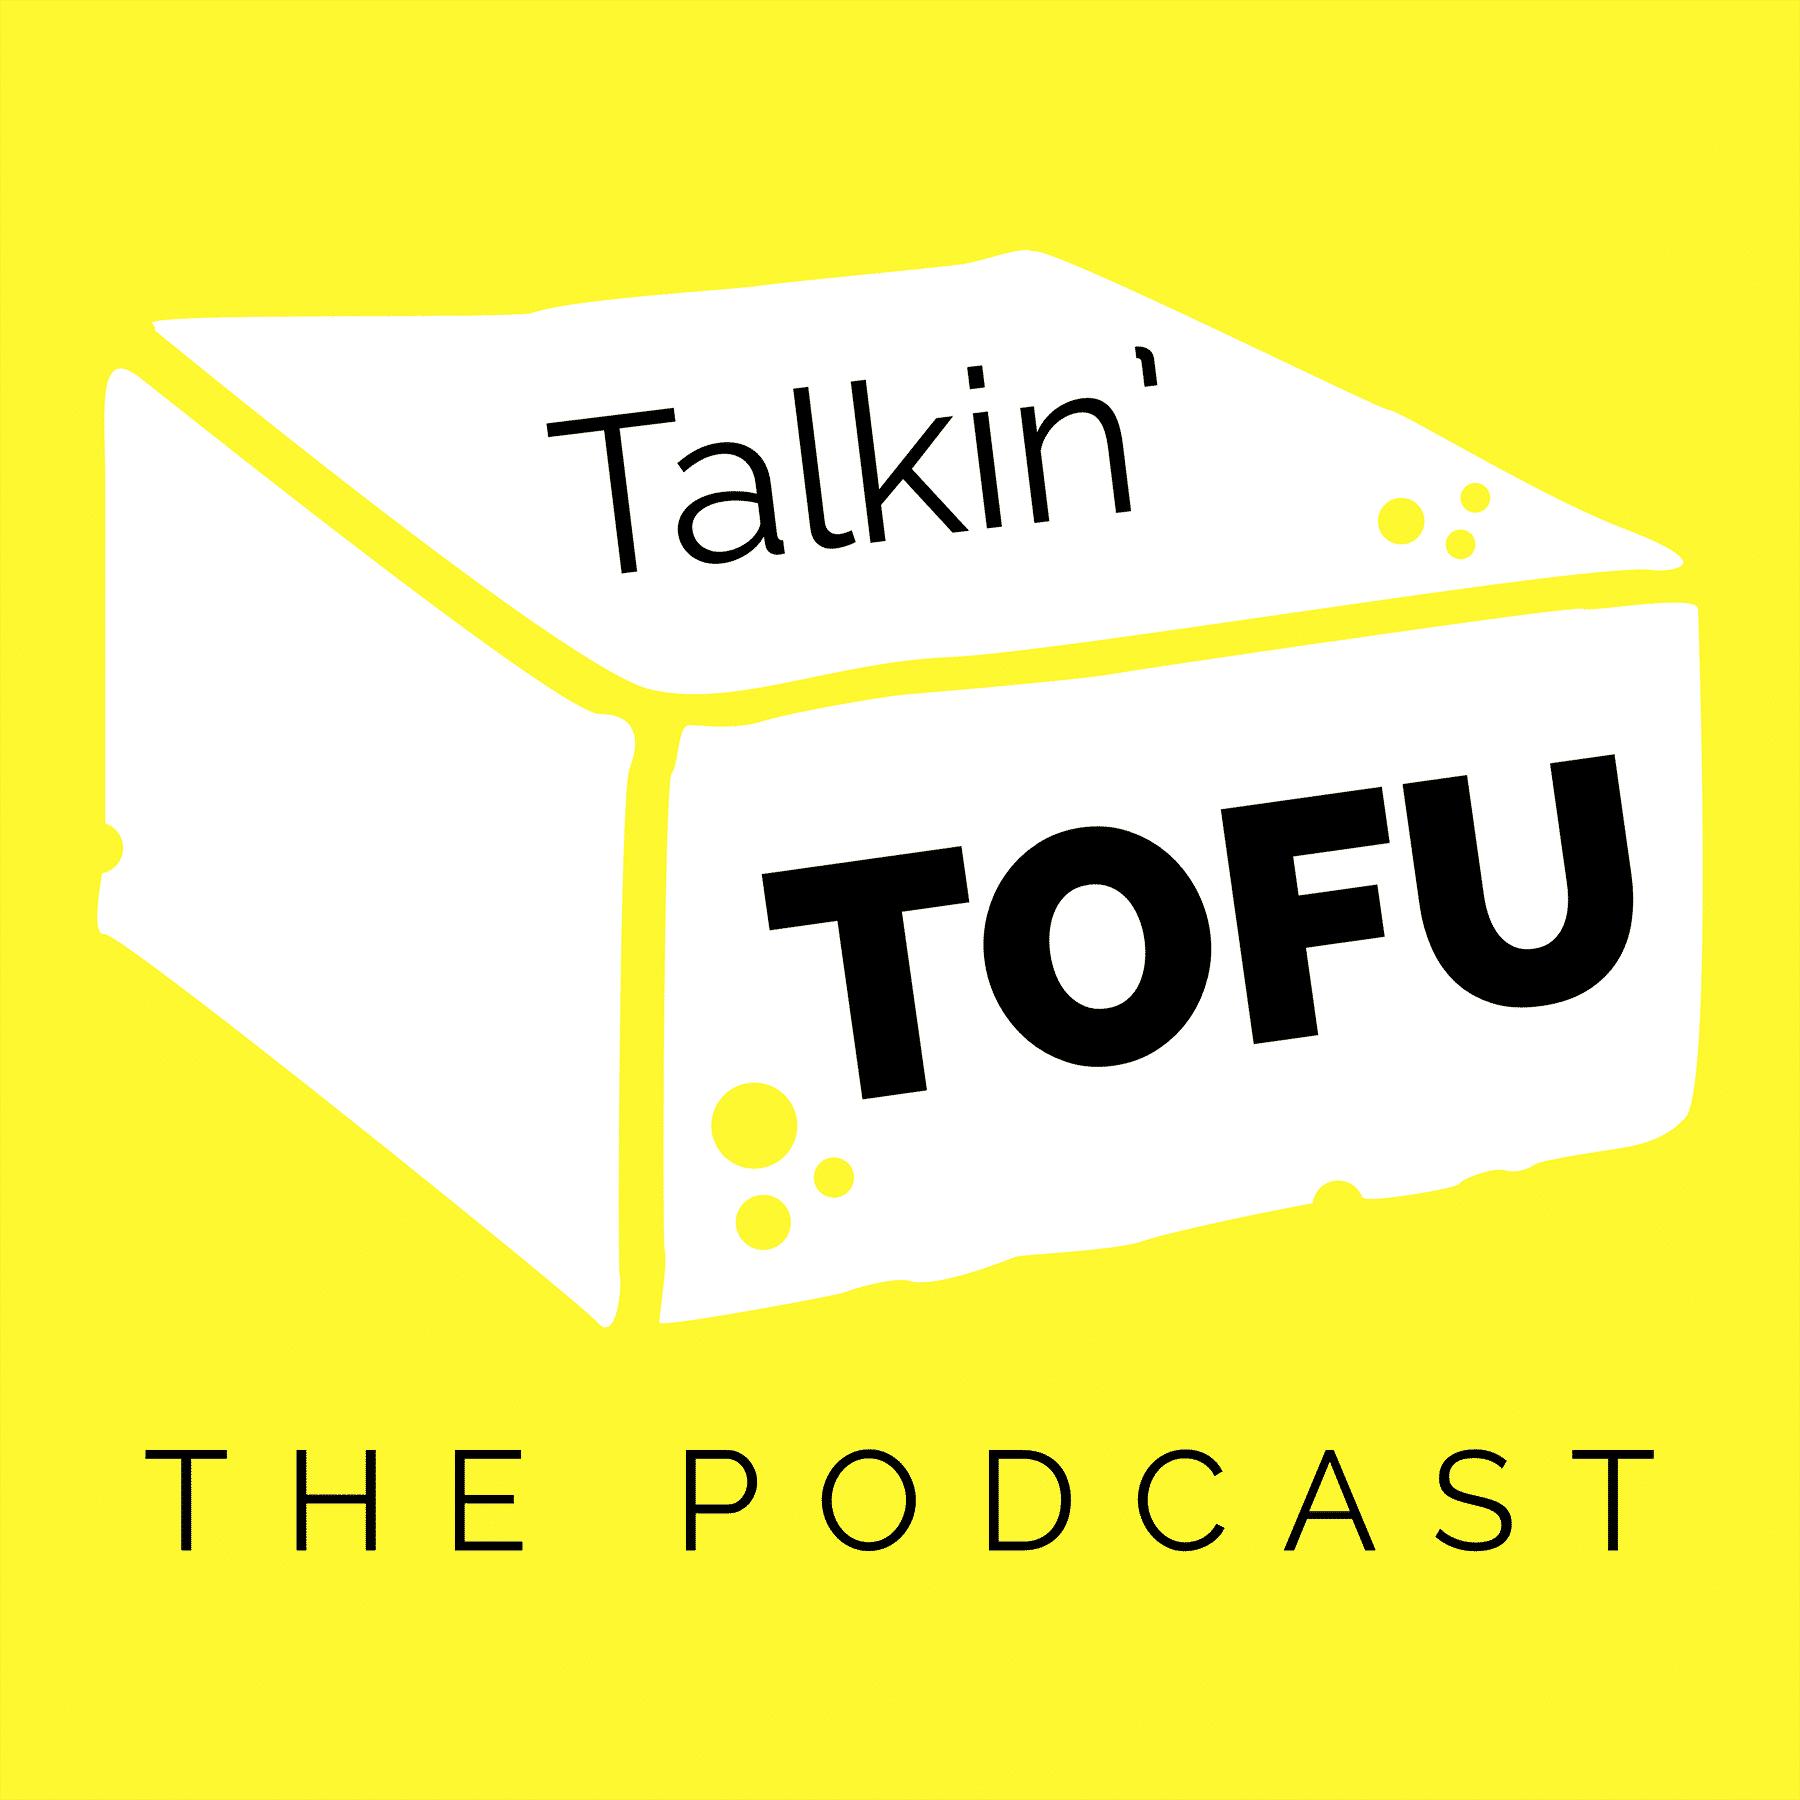 Talkin' Tofu logo on a yellow background